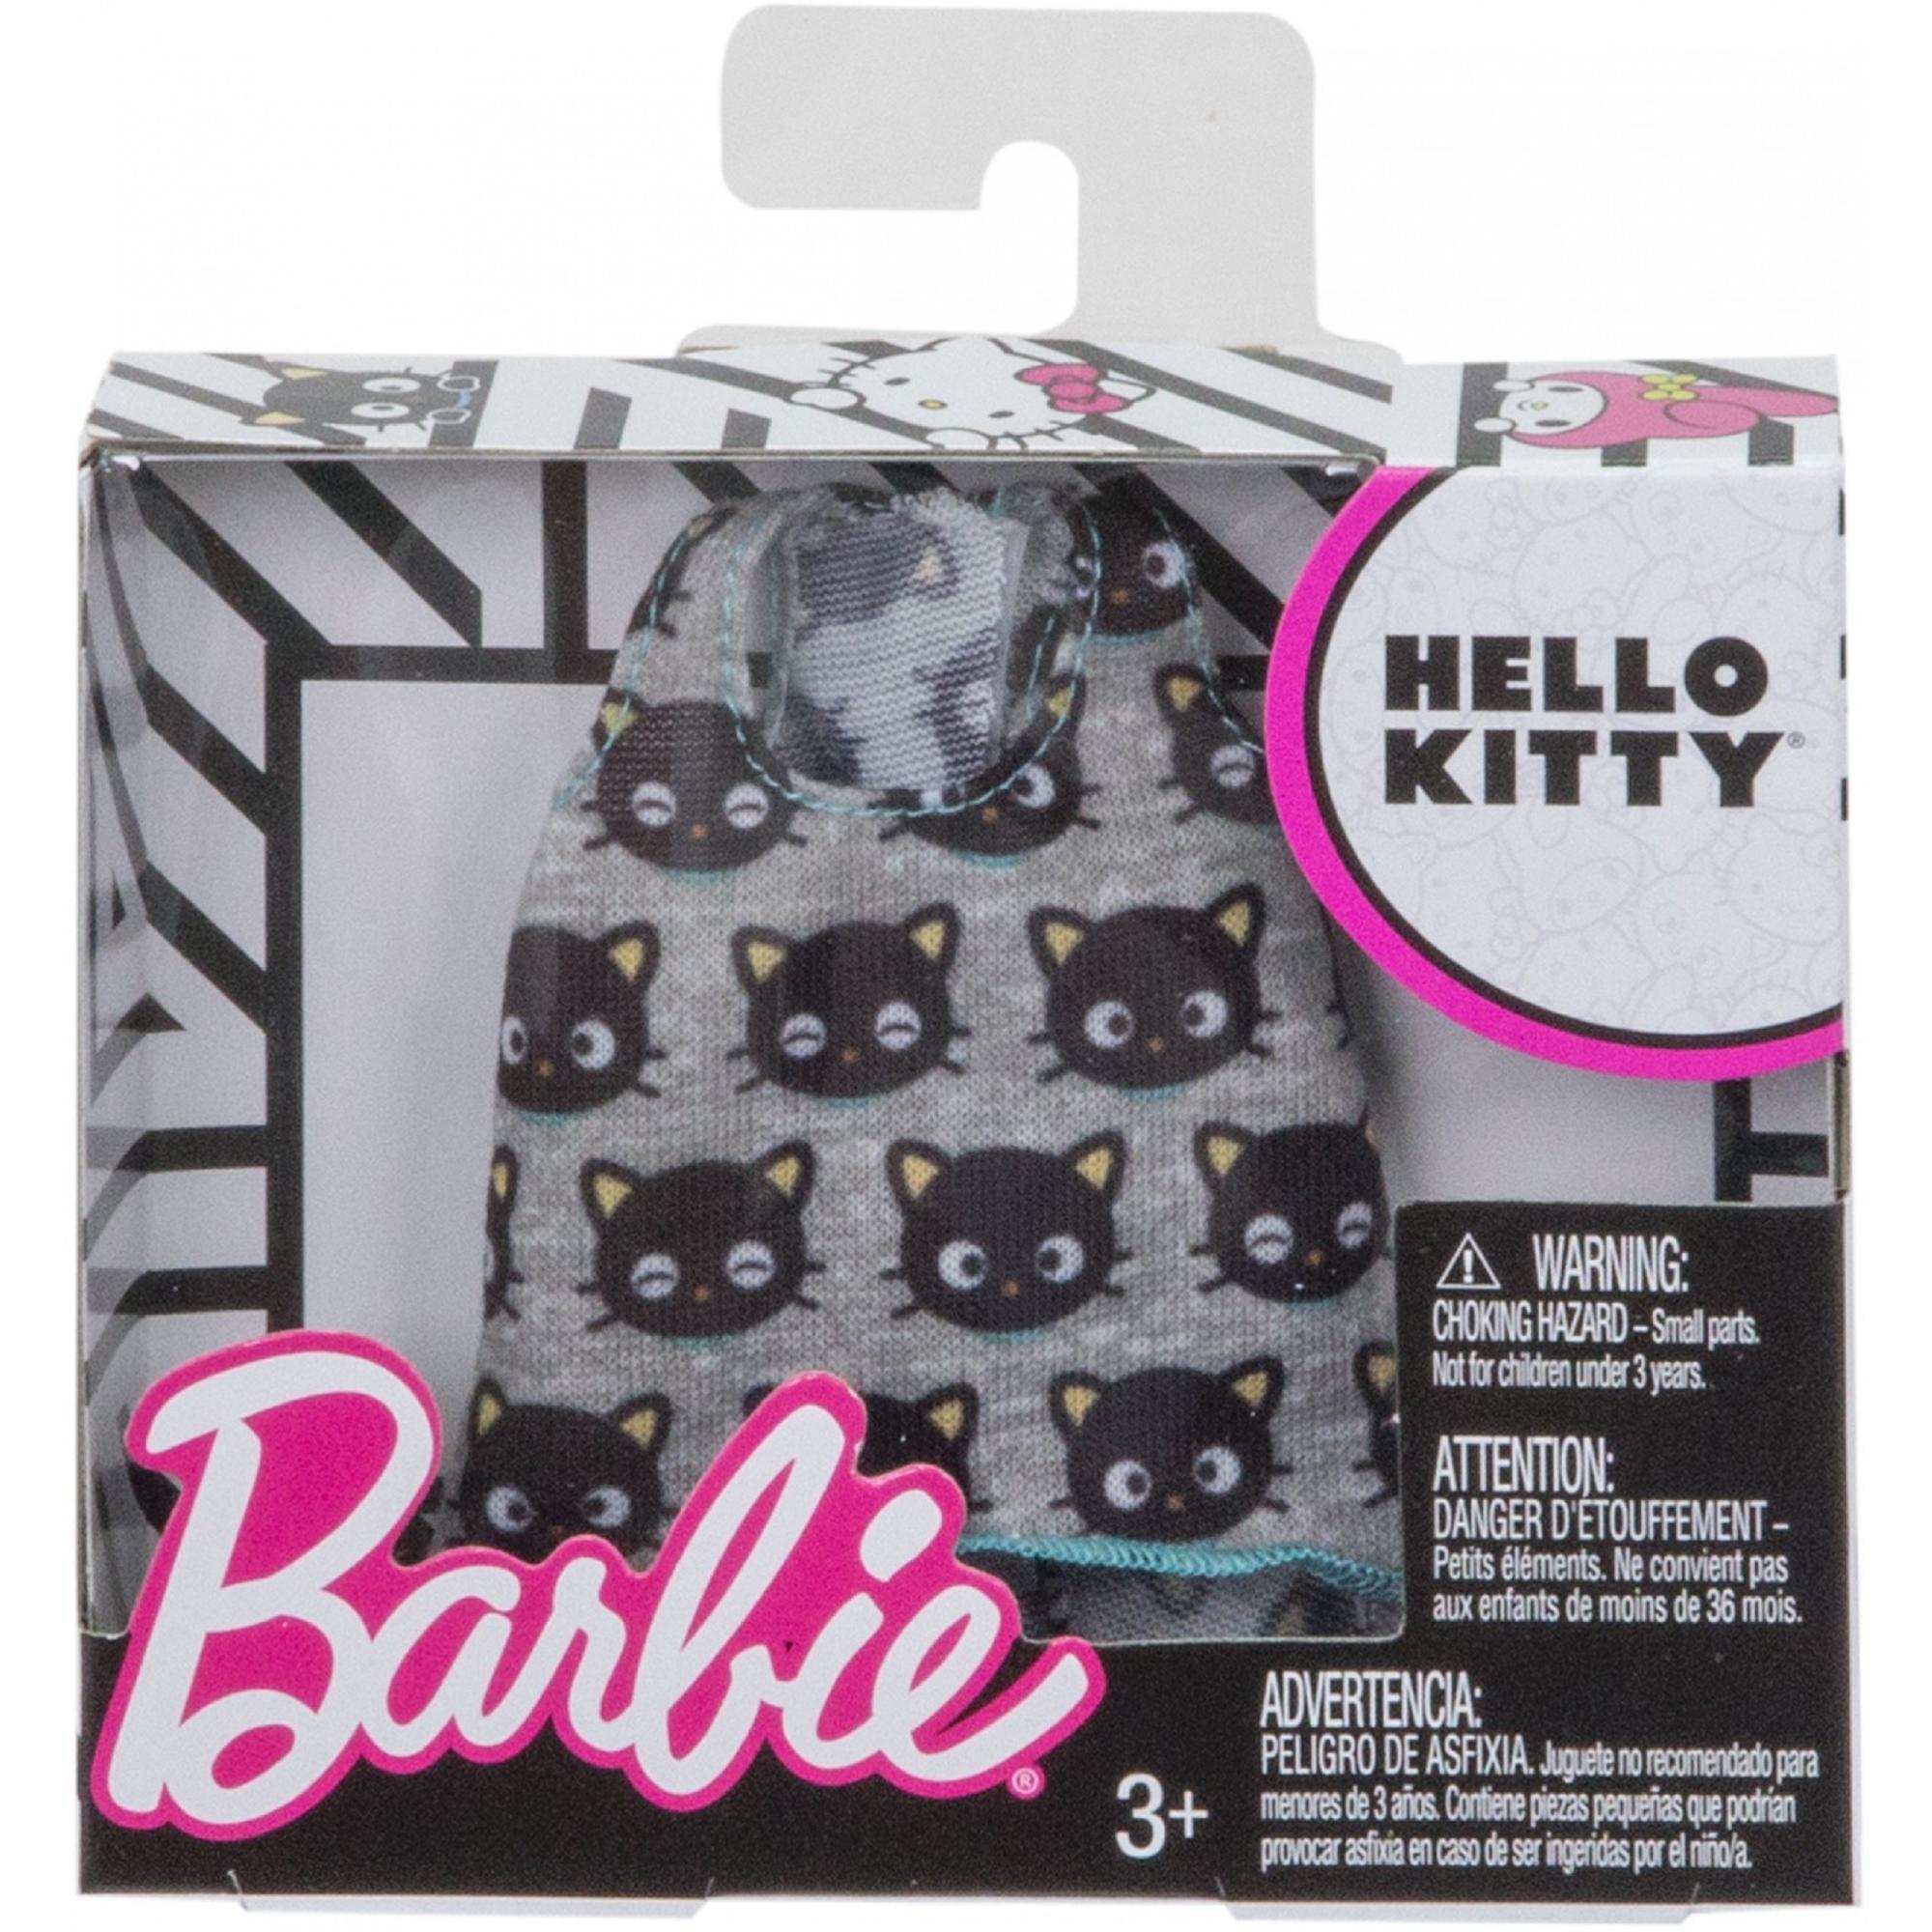 Barbie Hello Kitty Gray Tank by Mattel